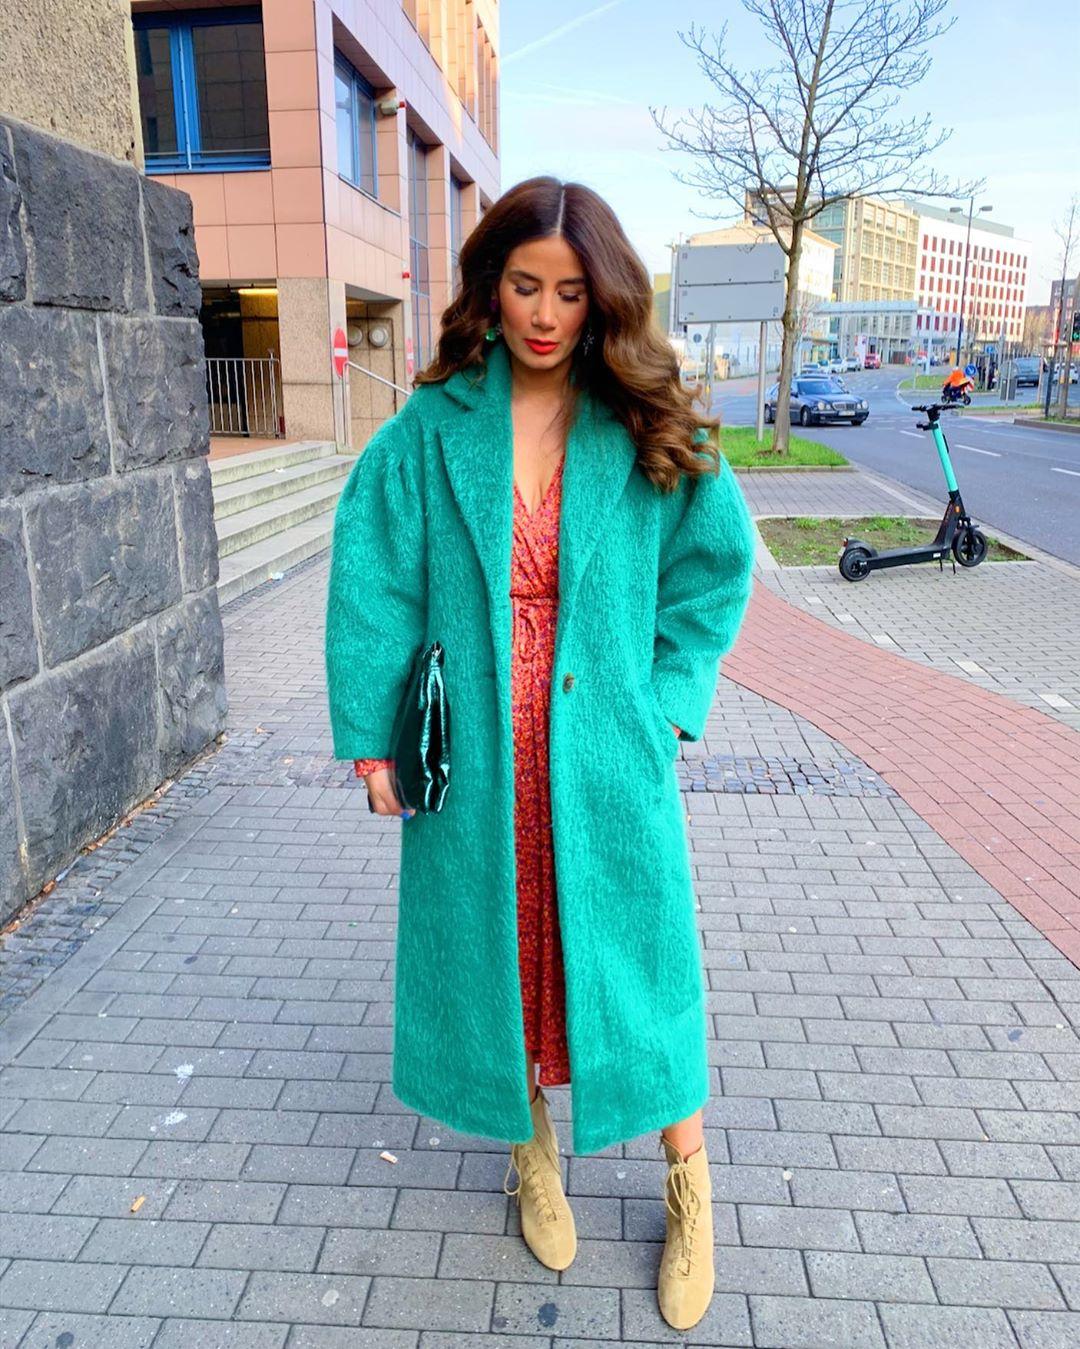 lace-up leather heel ankle boots de Zara sur tataass_